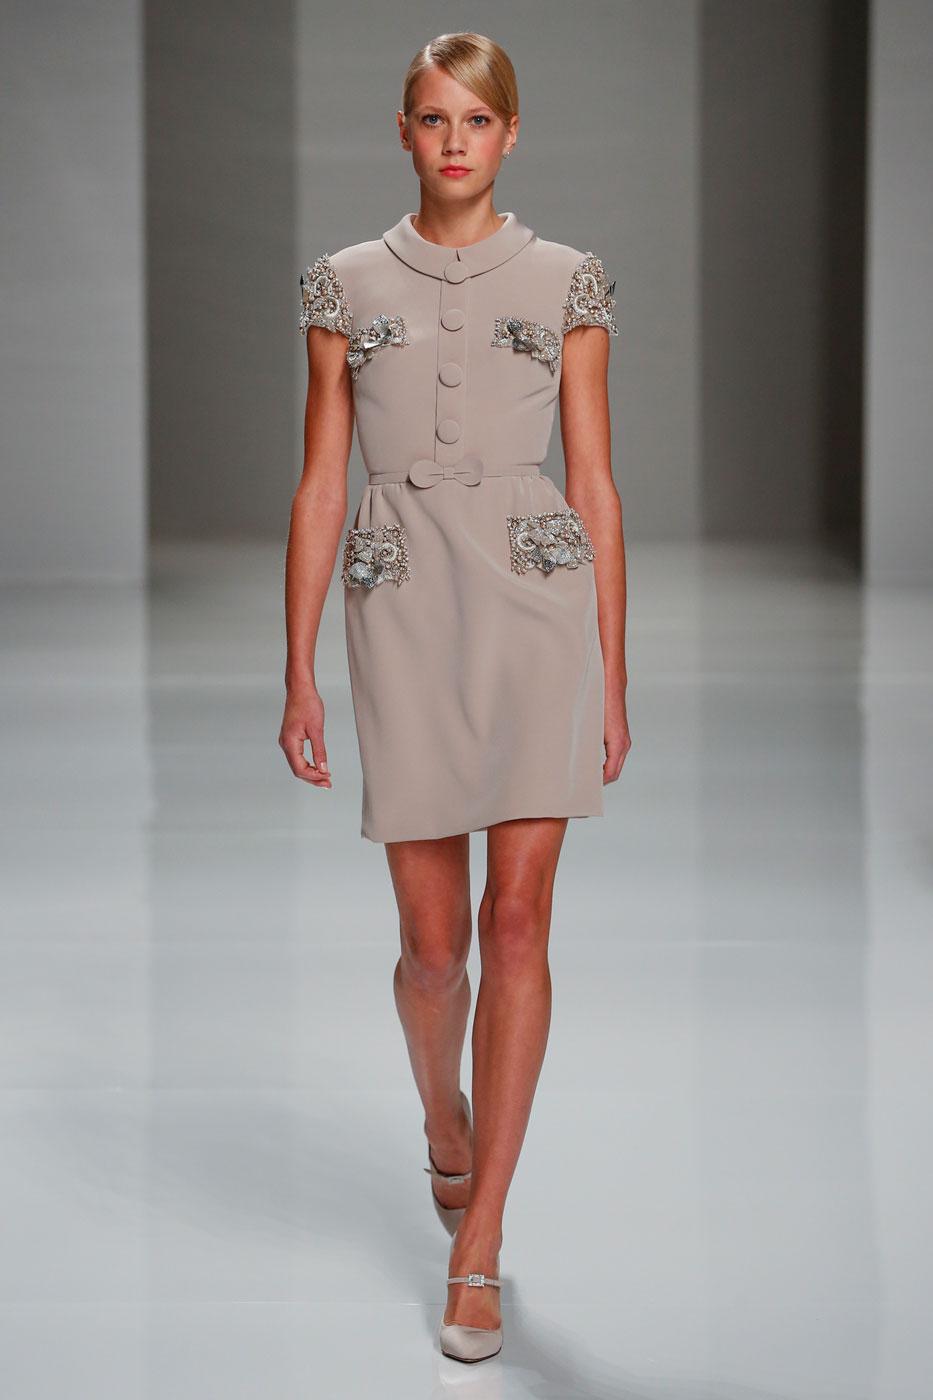 Georges-Hobeika-fashion-runway-show-haute-couture-paris-spring-2015-the-impression-33